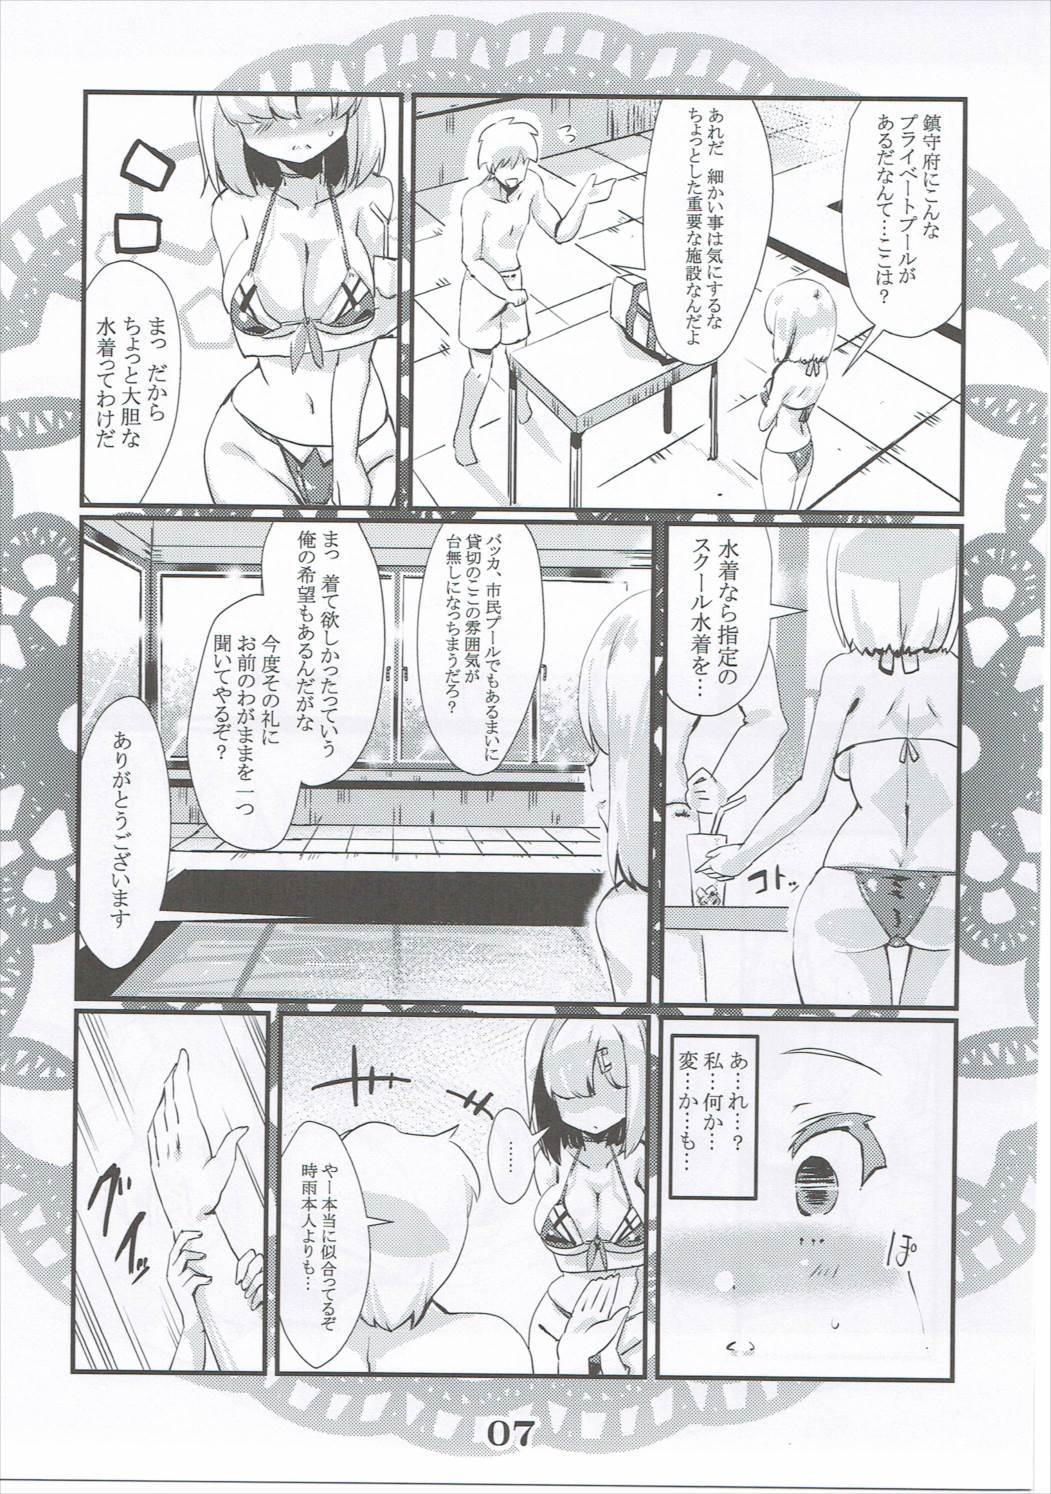 Rensou Harugatari 20 5